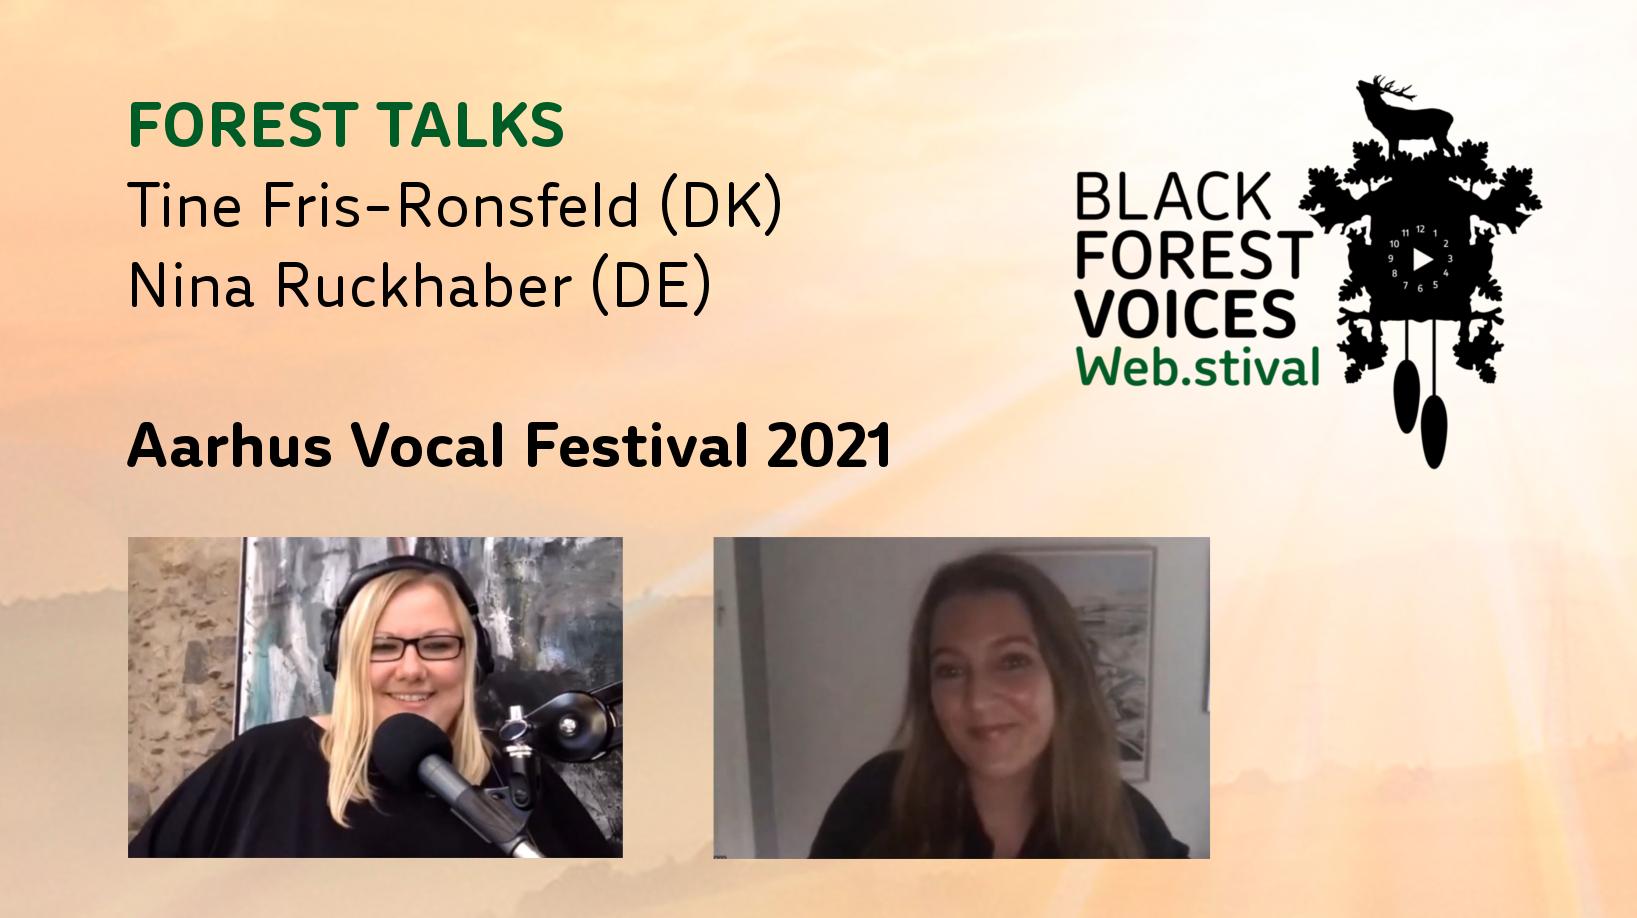 Talk mit Tine Fris-Ronsfeld: Aarhus Vocal Festival 2021